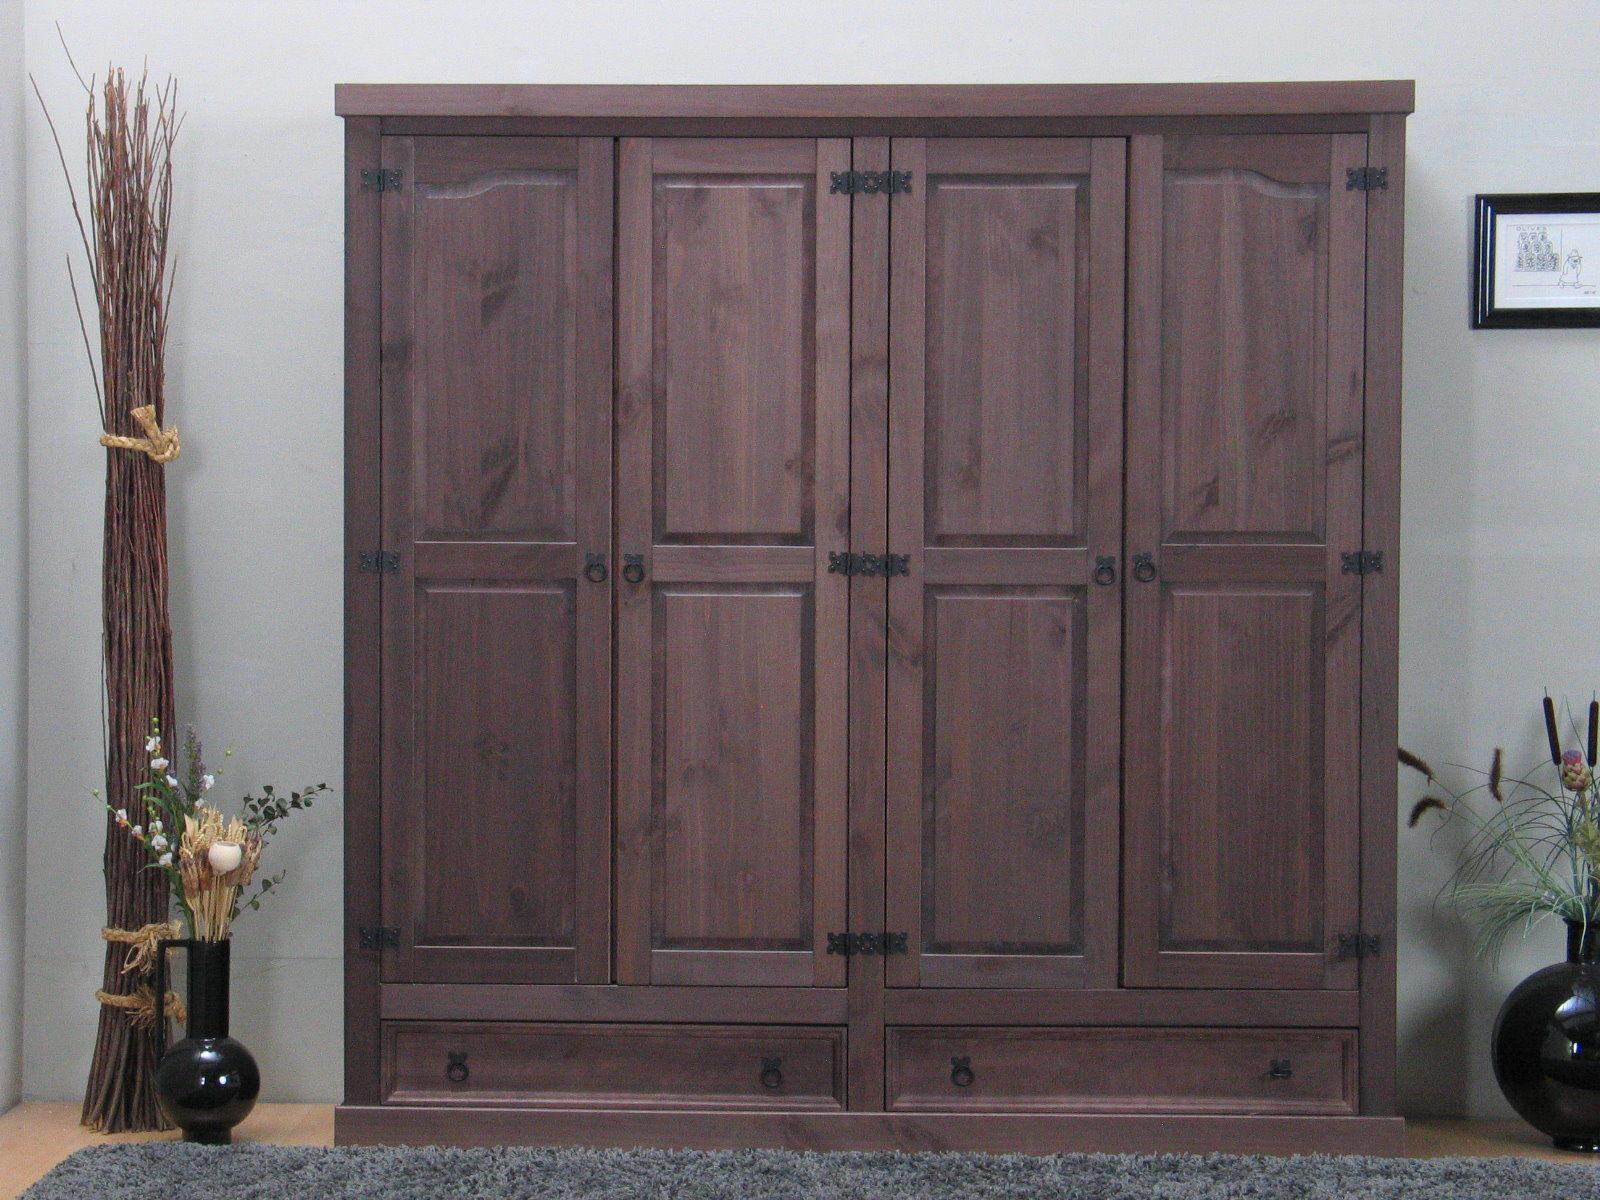 4tr kleiderschrank new mexiko kiefer massiv schlafzimmer. Black Bedroom Furniture Sets. Home Design Ideas